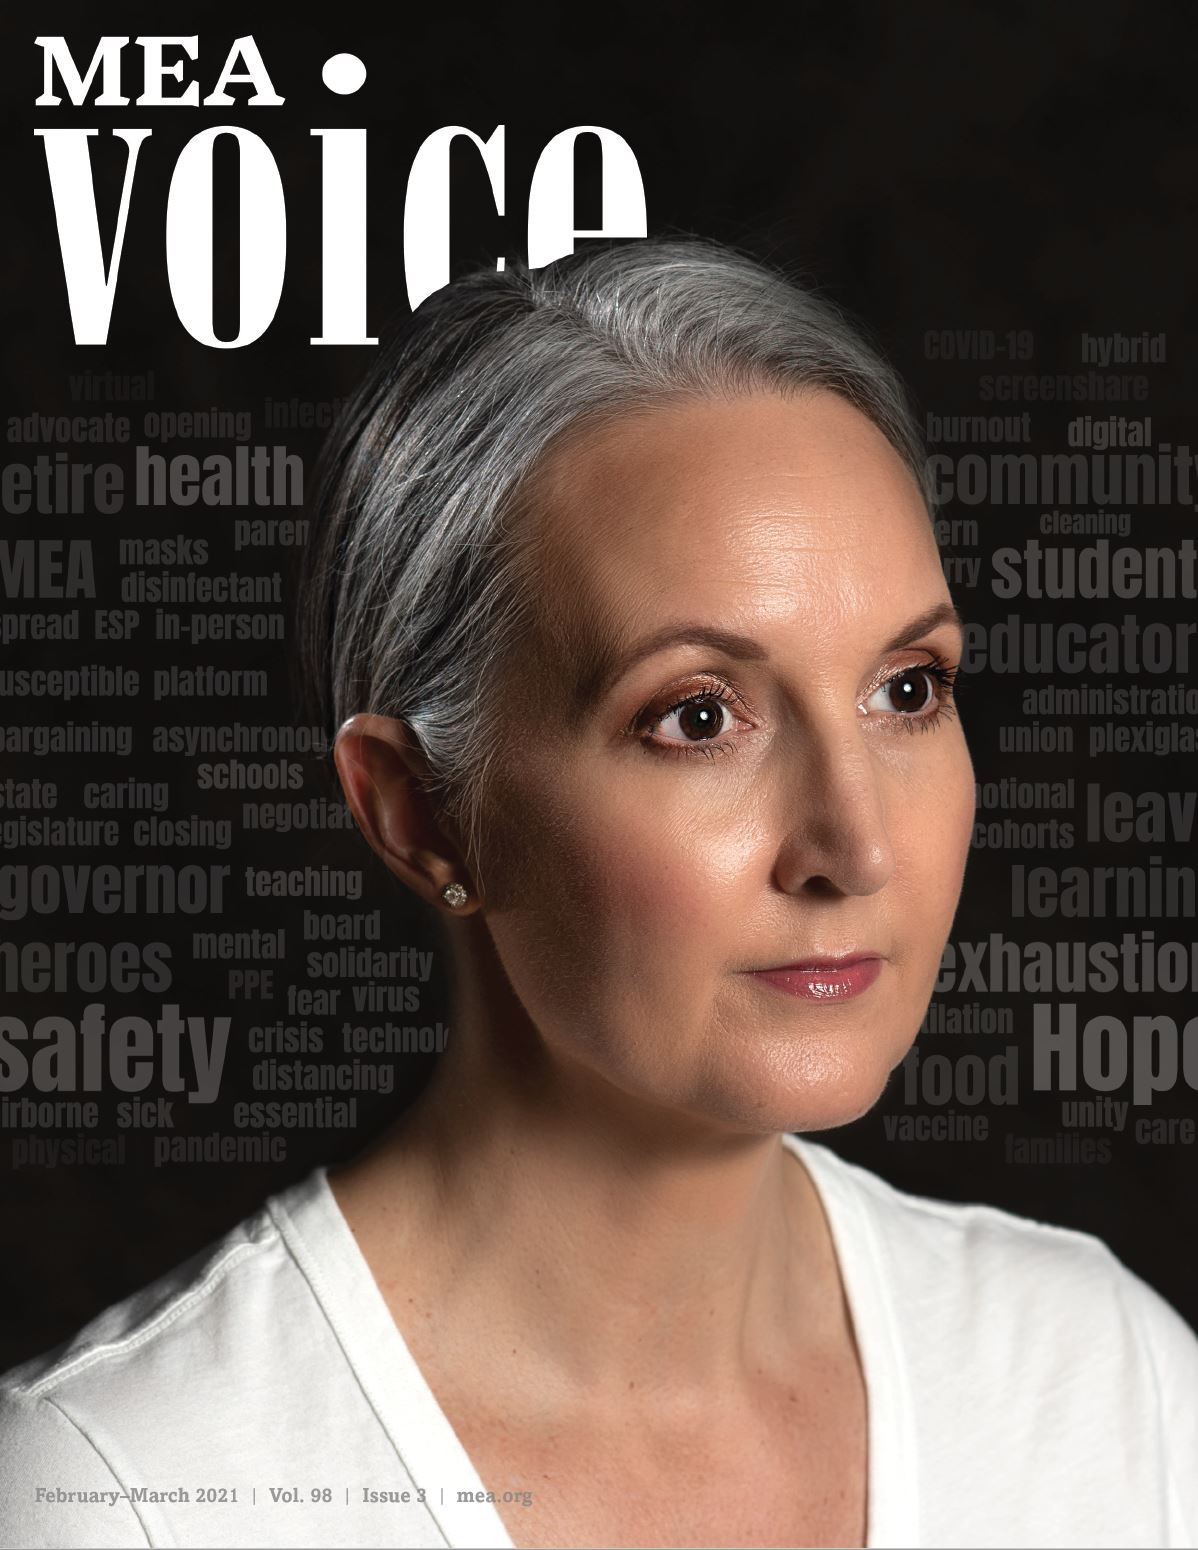 MEA Voice Magazine – February 2021 Issue